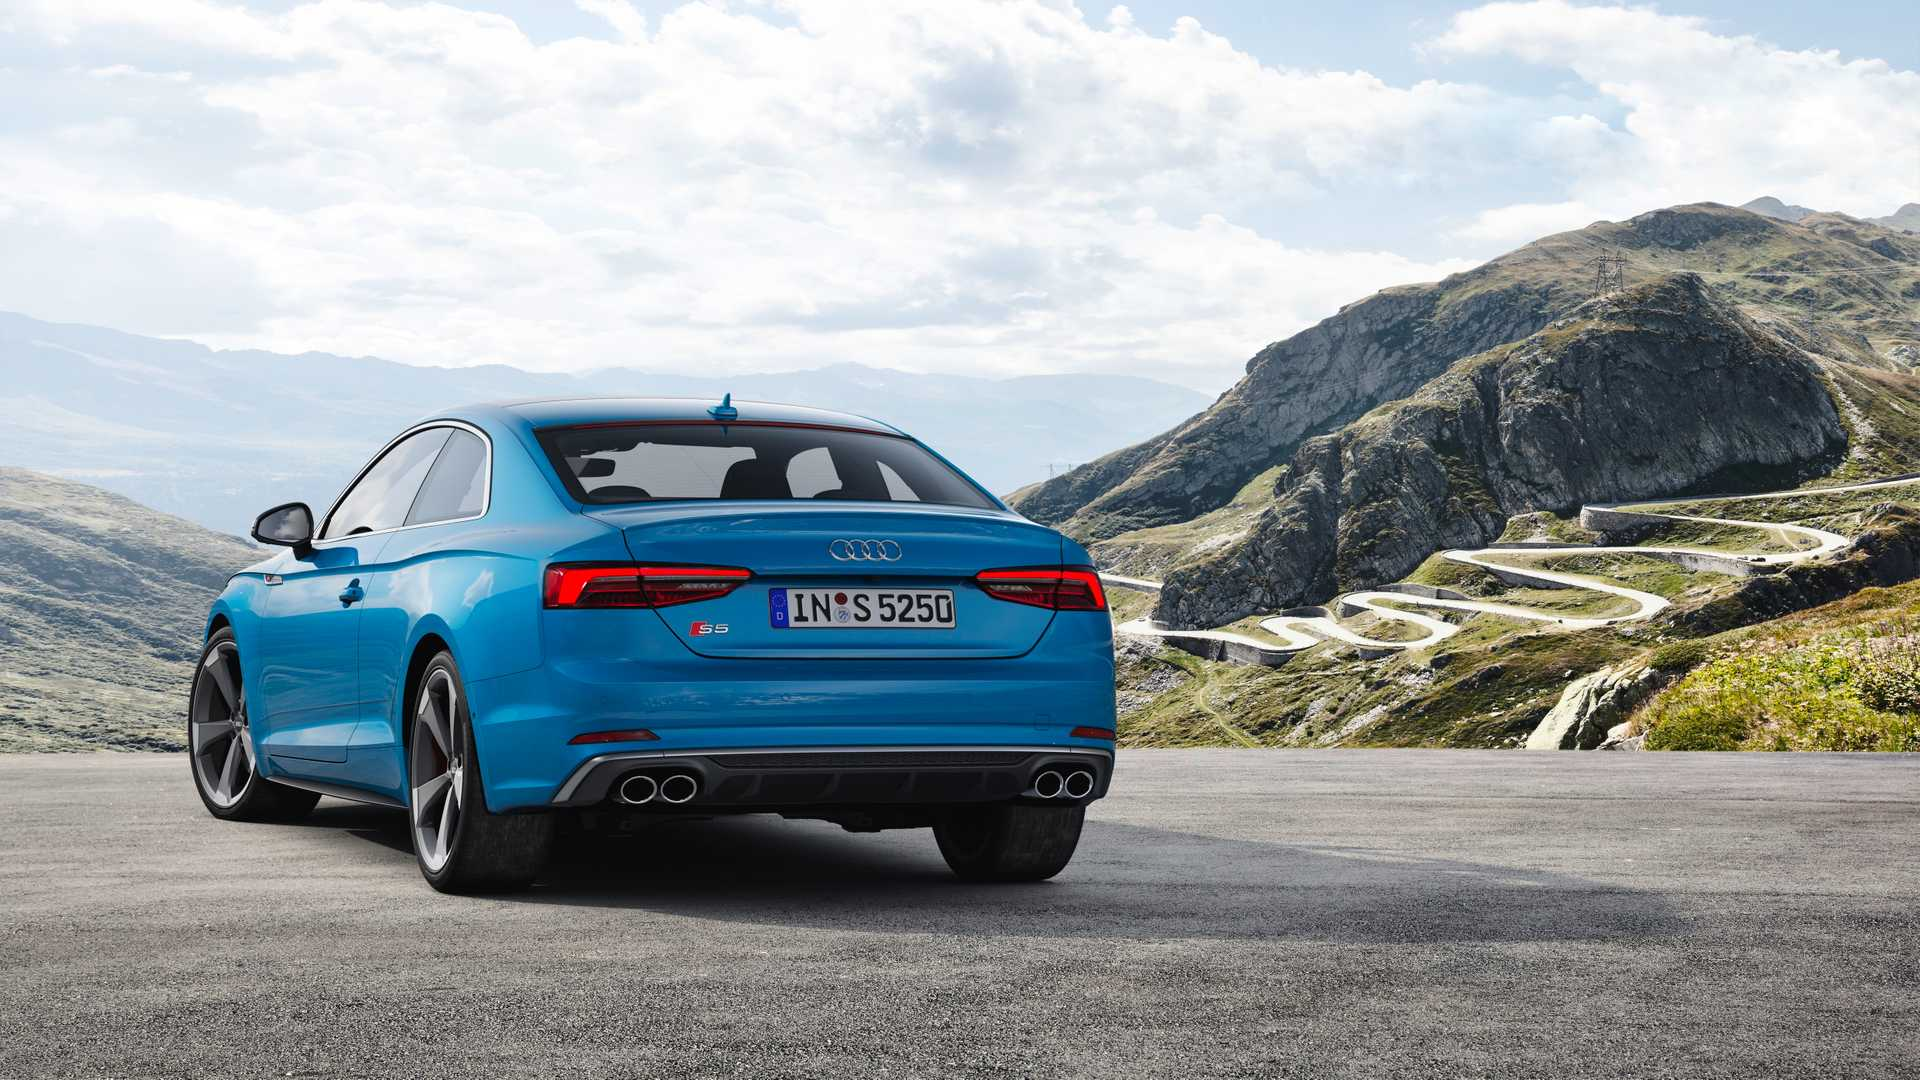 2019 Audi S5 Coupé TDI Rear Wallpapers (10)